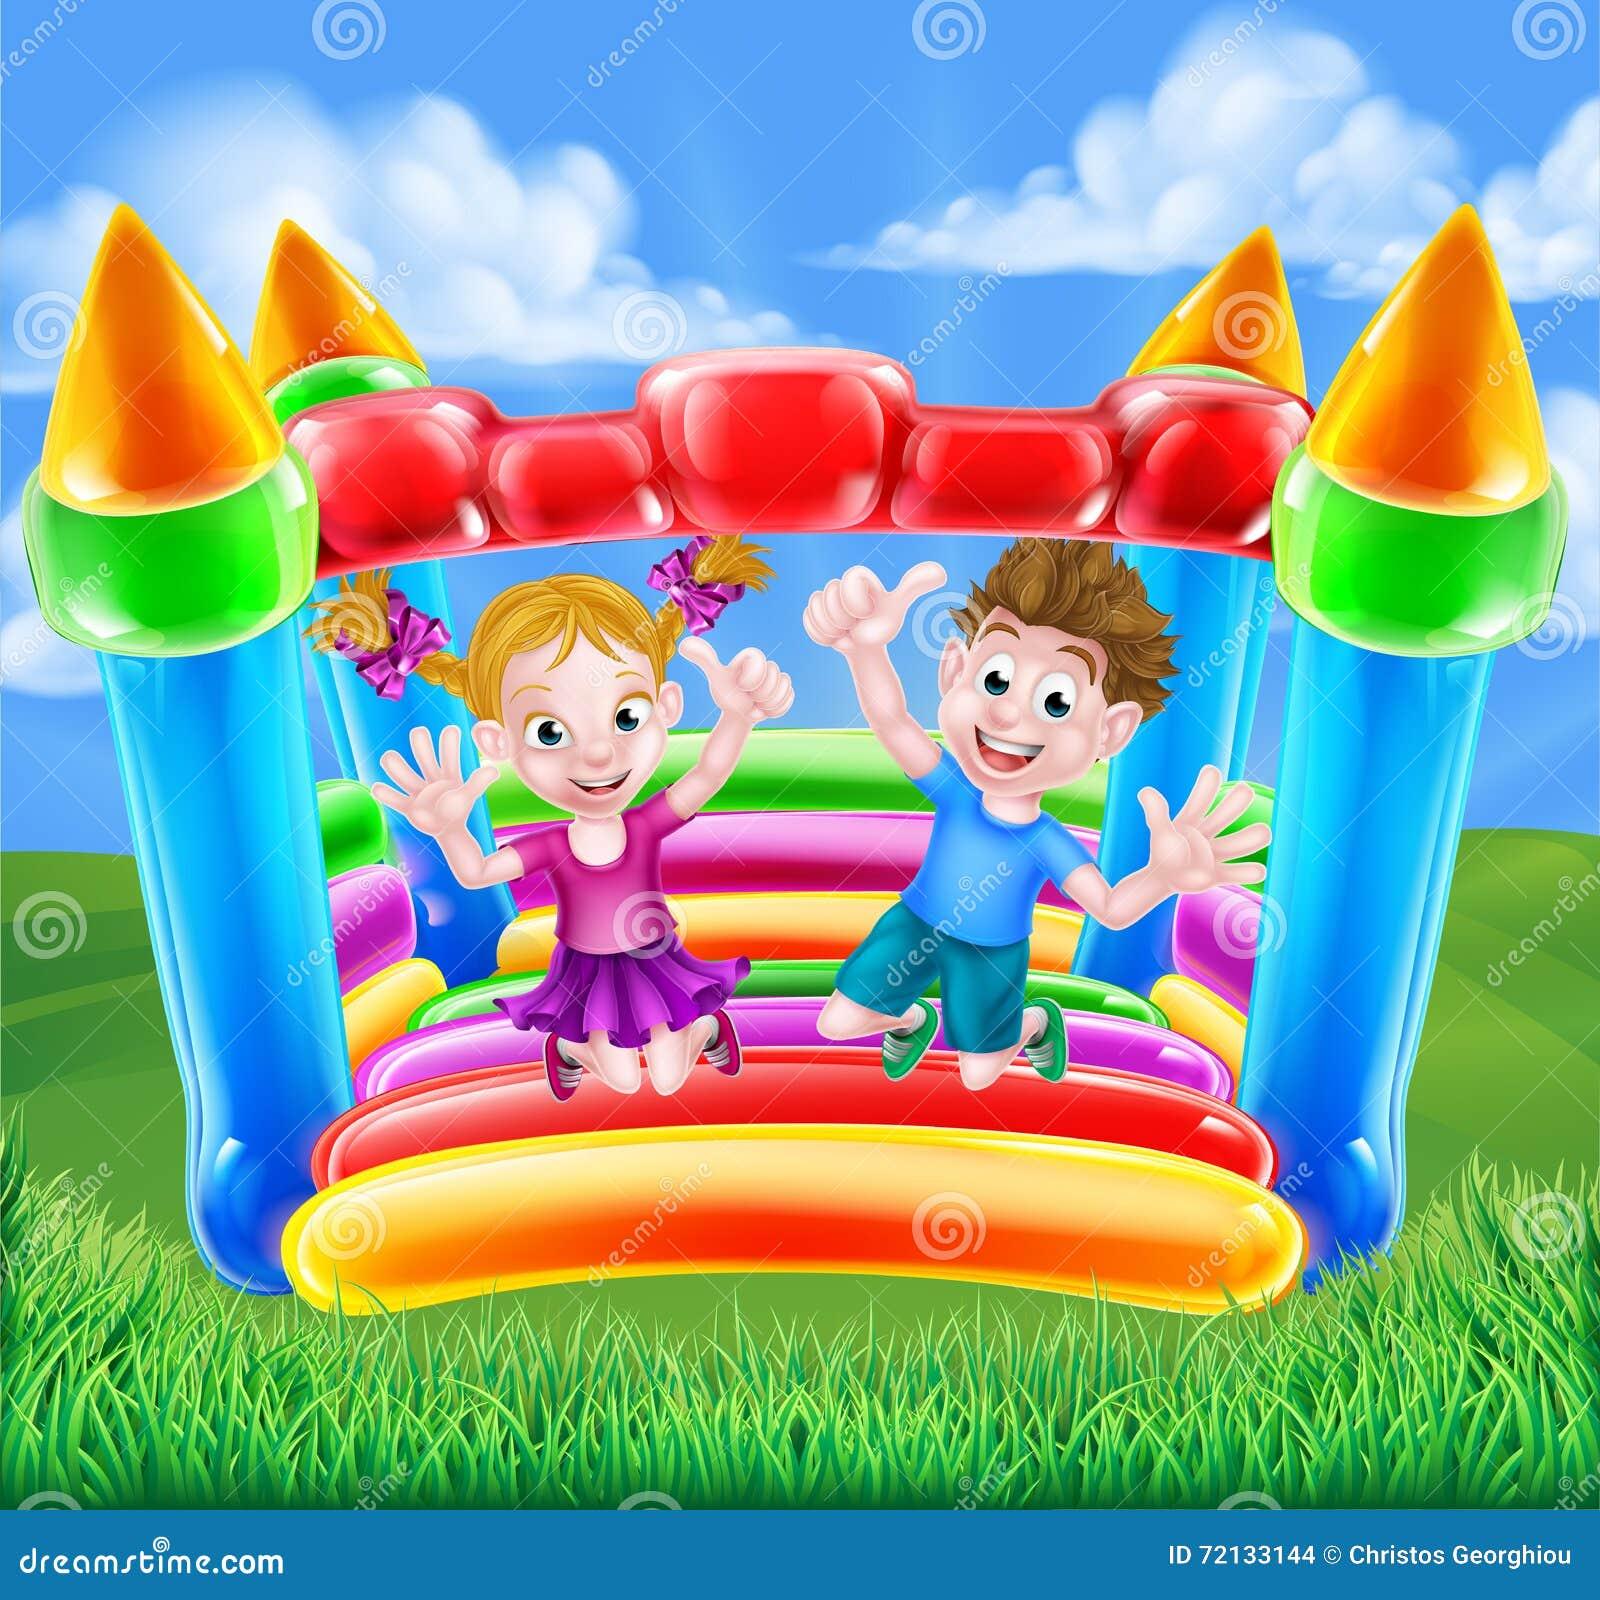 Cartoon Kids On Bouncy Castle Vector Illustration